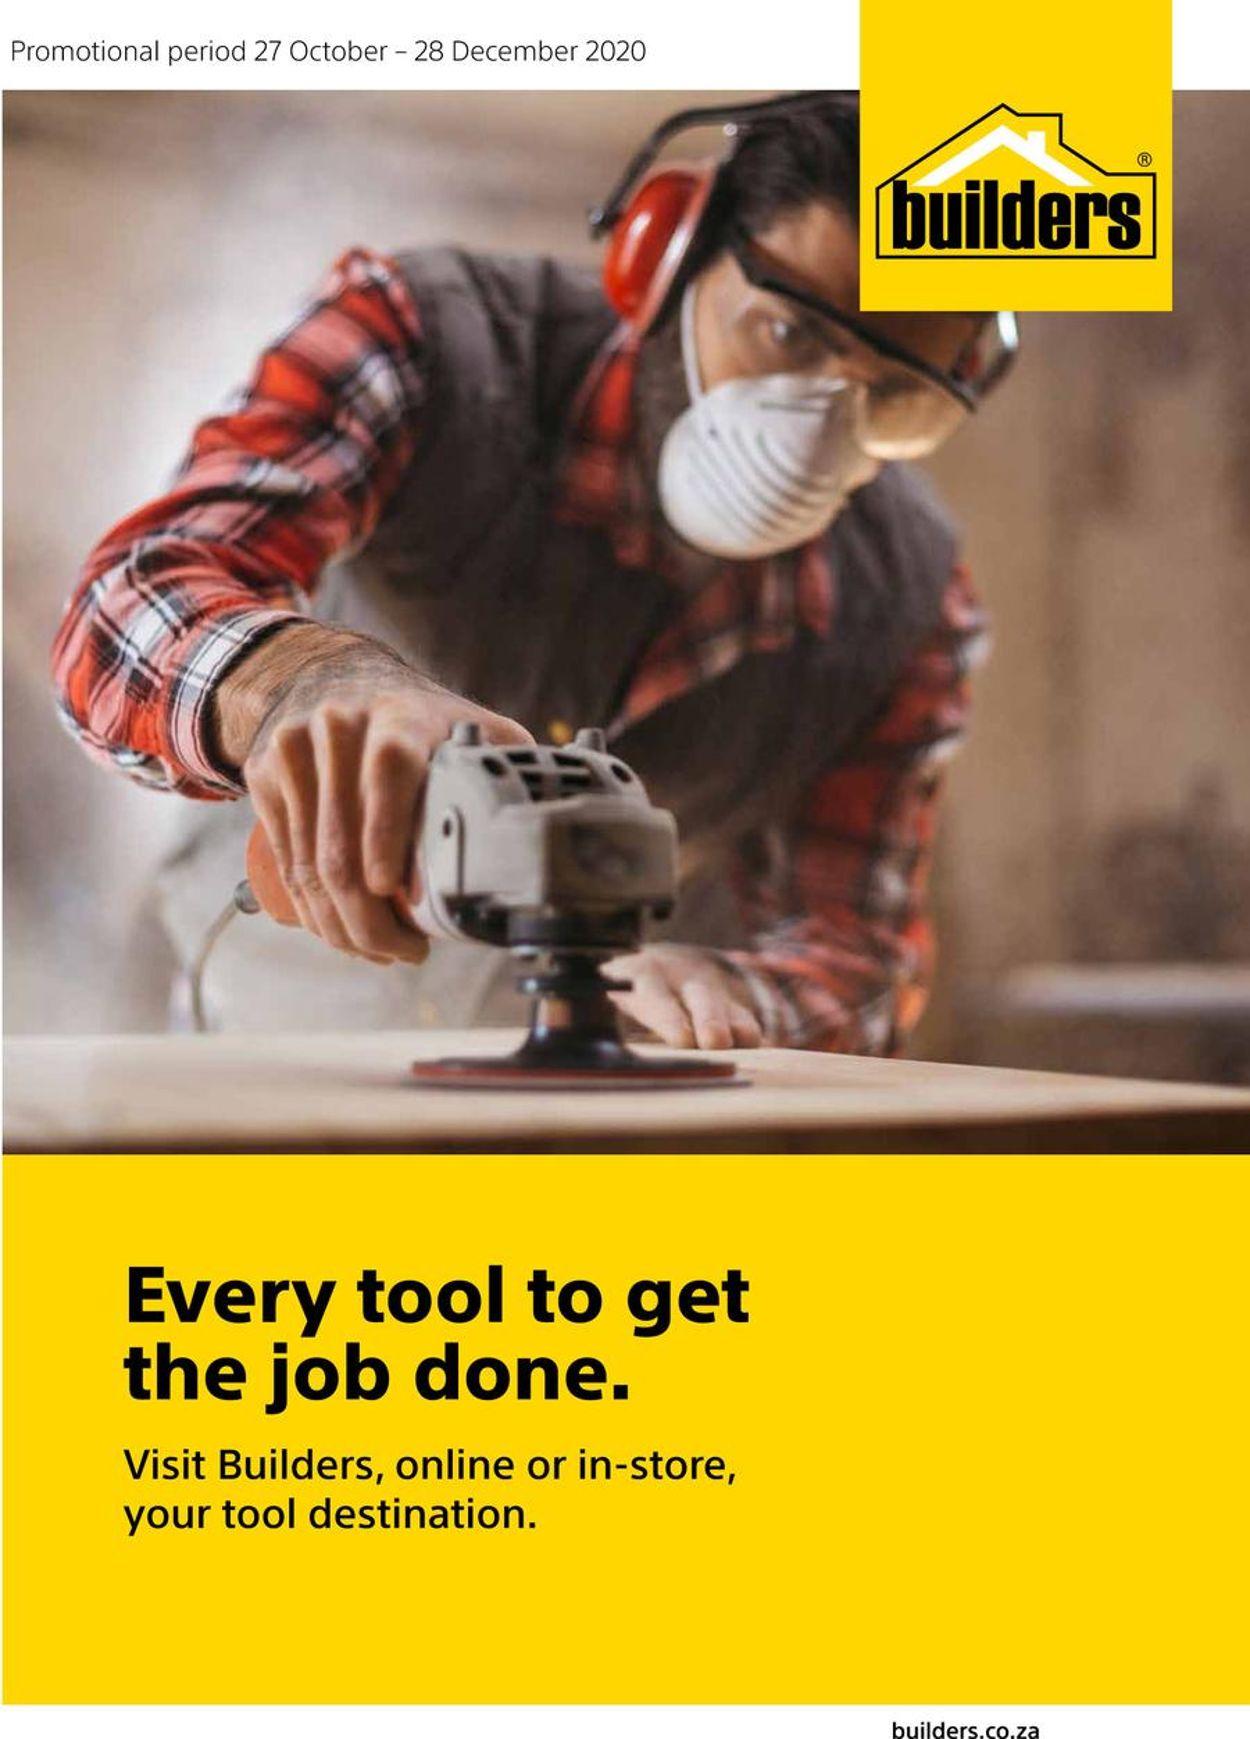 Builders Warehouse Catalogue - 2020/10/27-2020/12/28